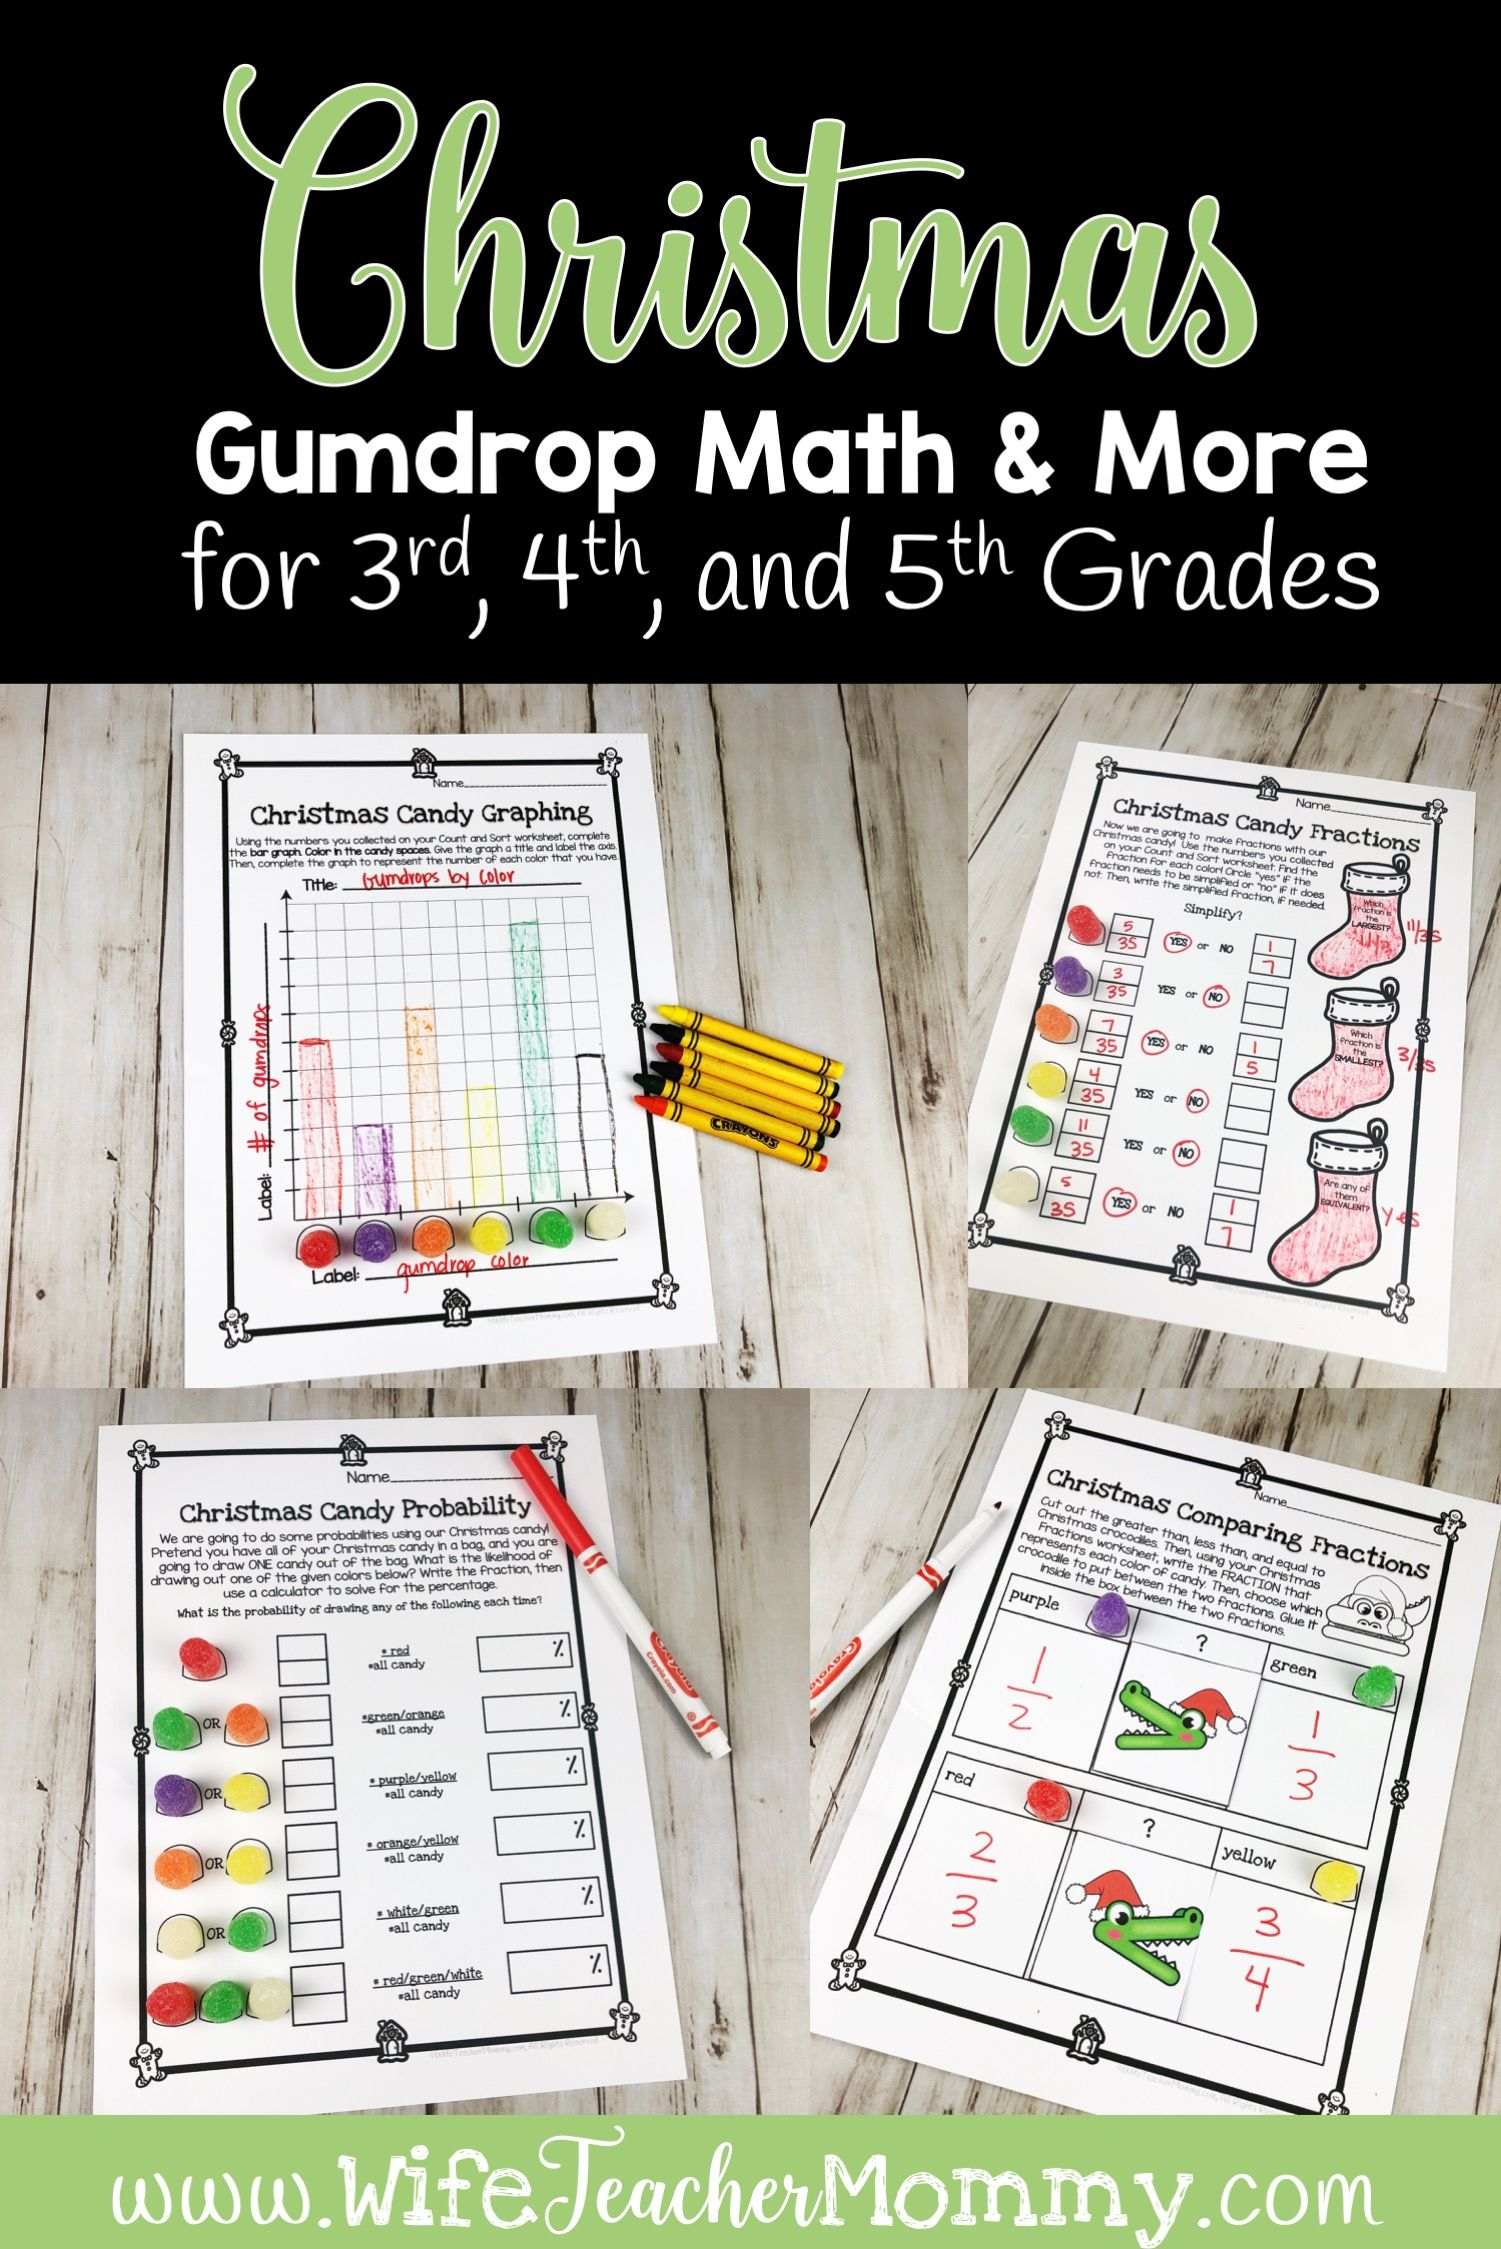 Christmas Gumdrop Math For 3rd Grade 4th Grade And 5th Grade Christmas Math Activities Christmas Math Centers Graphing Activities [ 2249 x 1501 Pixel ]